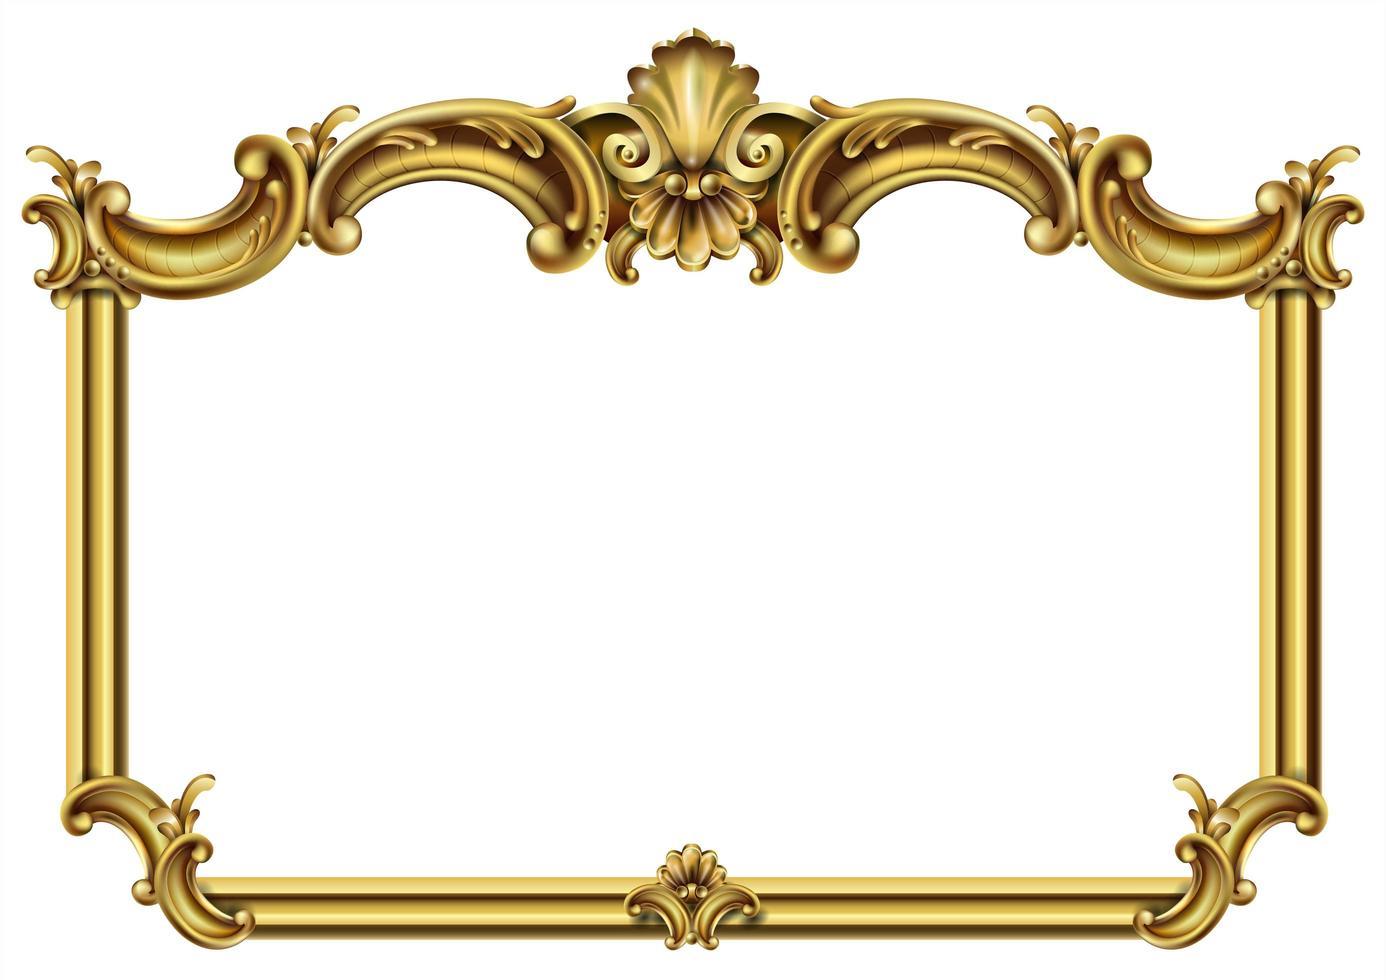 marco barroco rococó clásico dorado horizontal vector